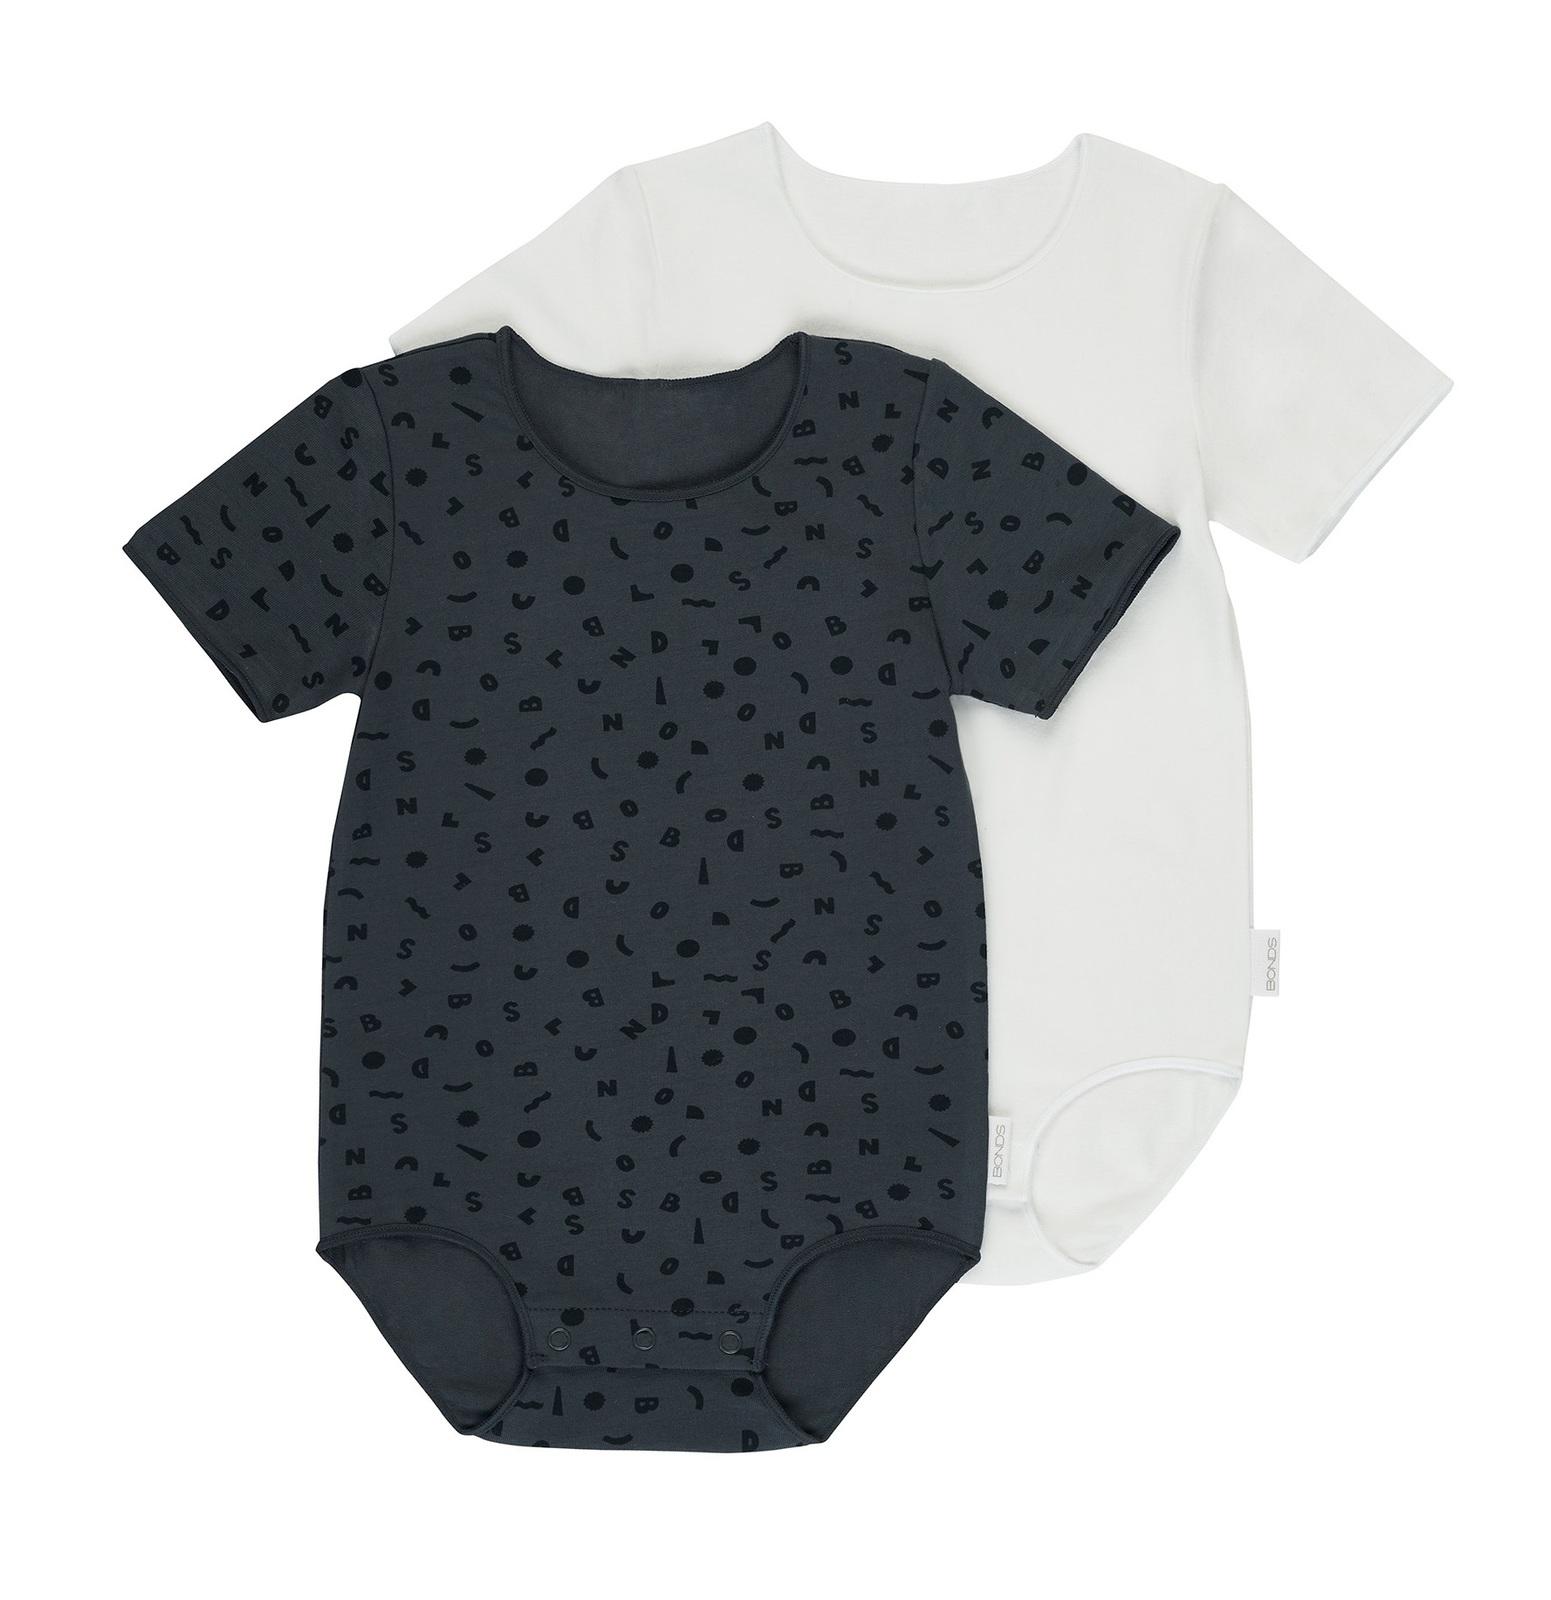 Wonderbodies Bodysuit 2-Pack - Bonds Grey/White (Size 0) image